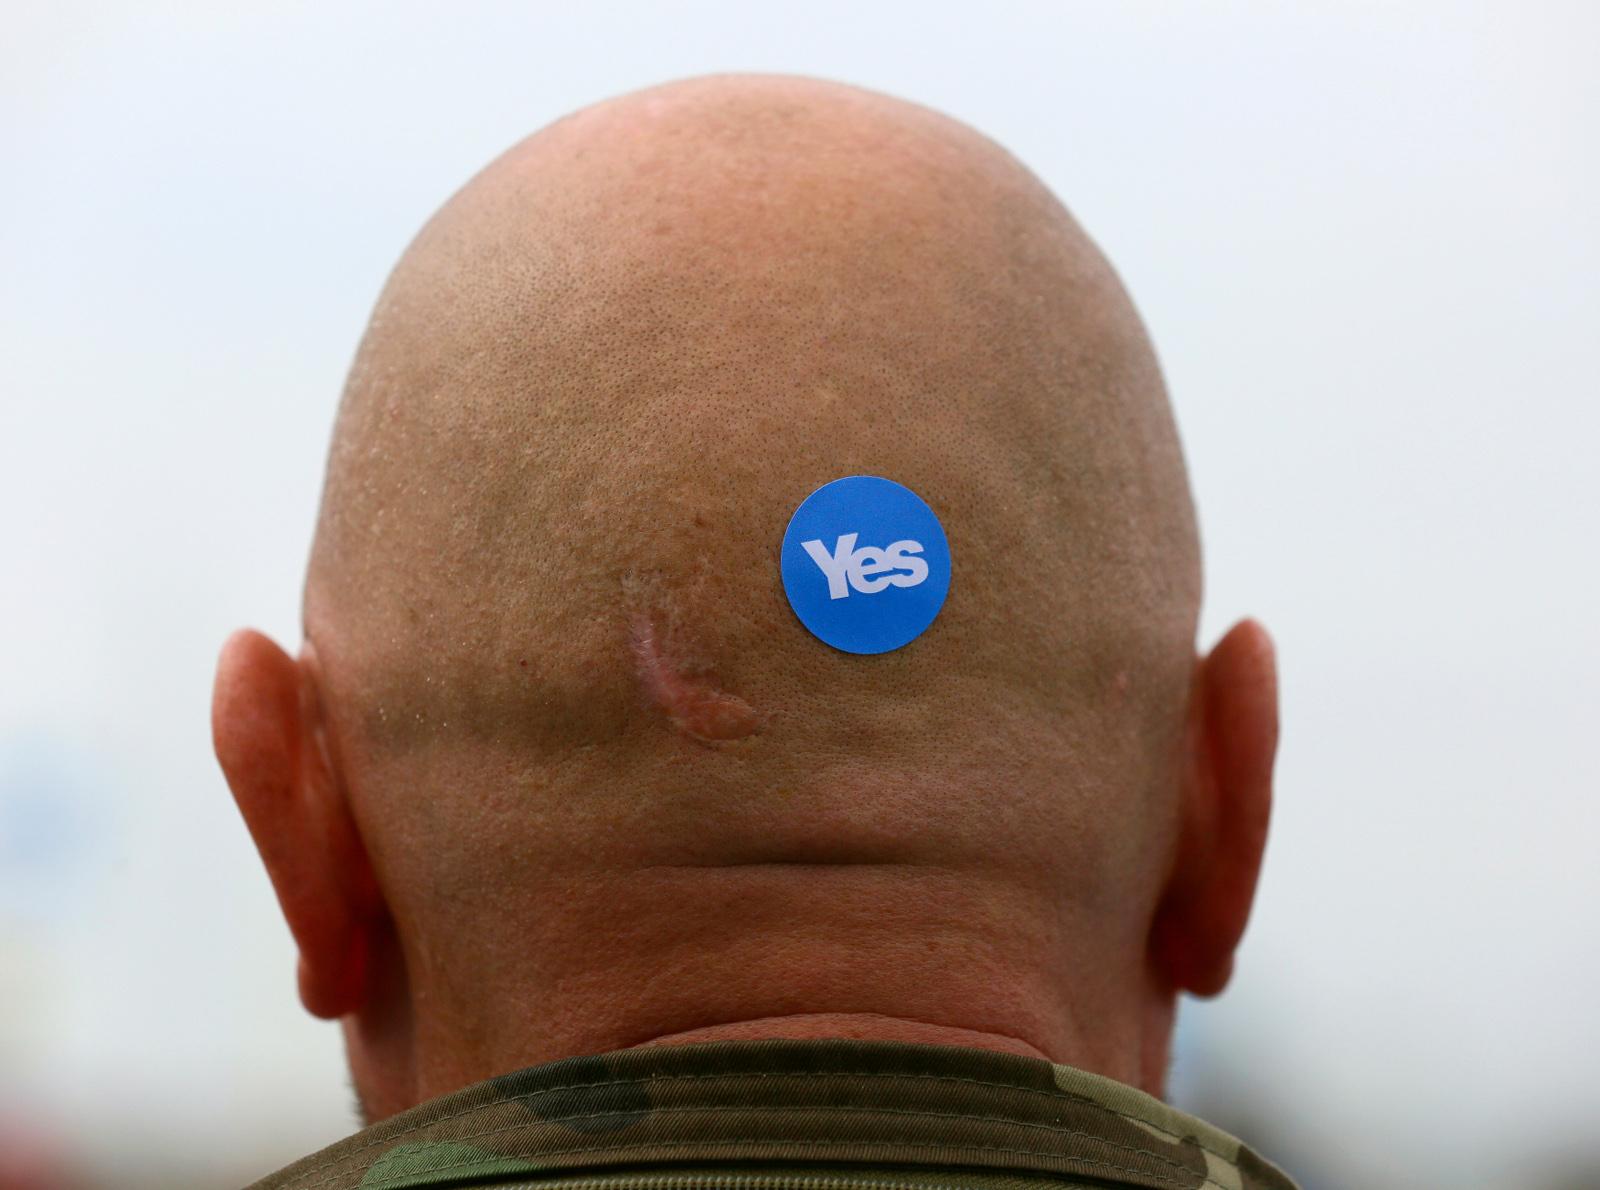 Yes sticker on bald mans head